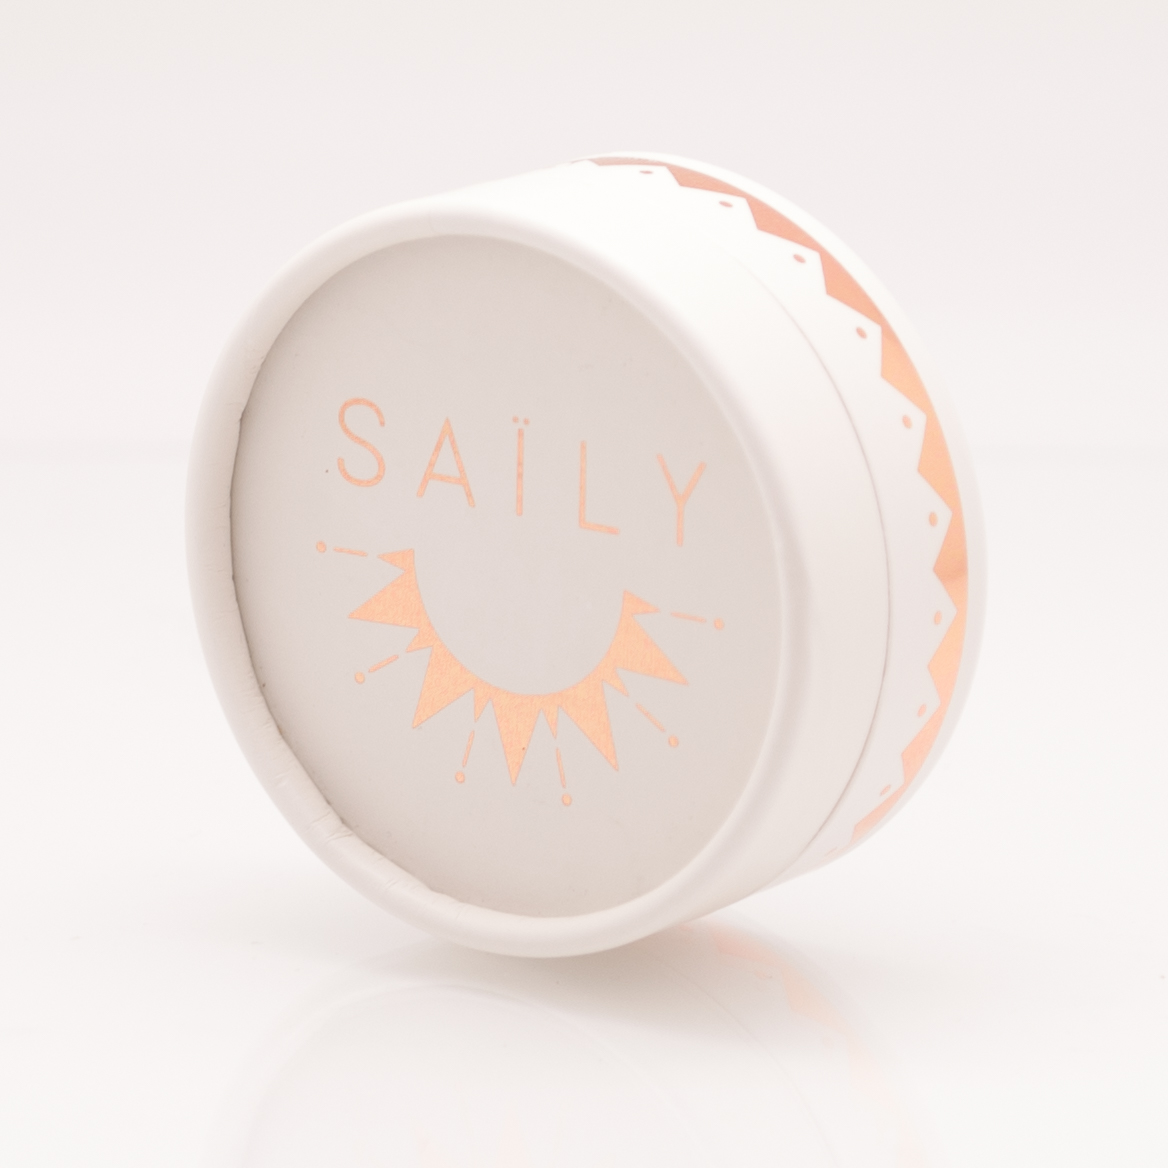 SAILY BOLA フットプリントマタニティネックレス -シルバー/ ピンクベージュ